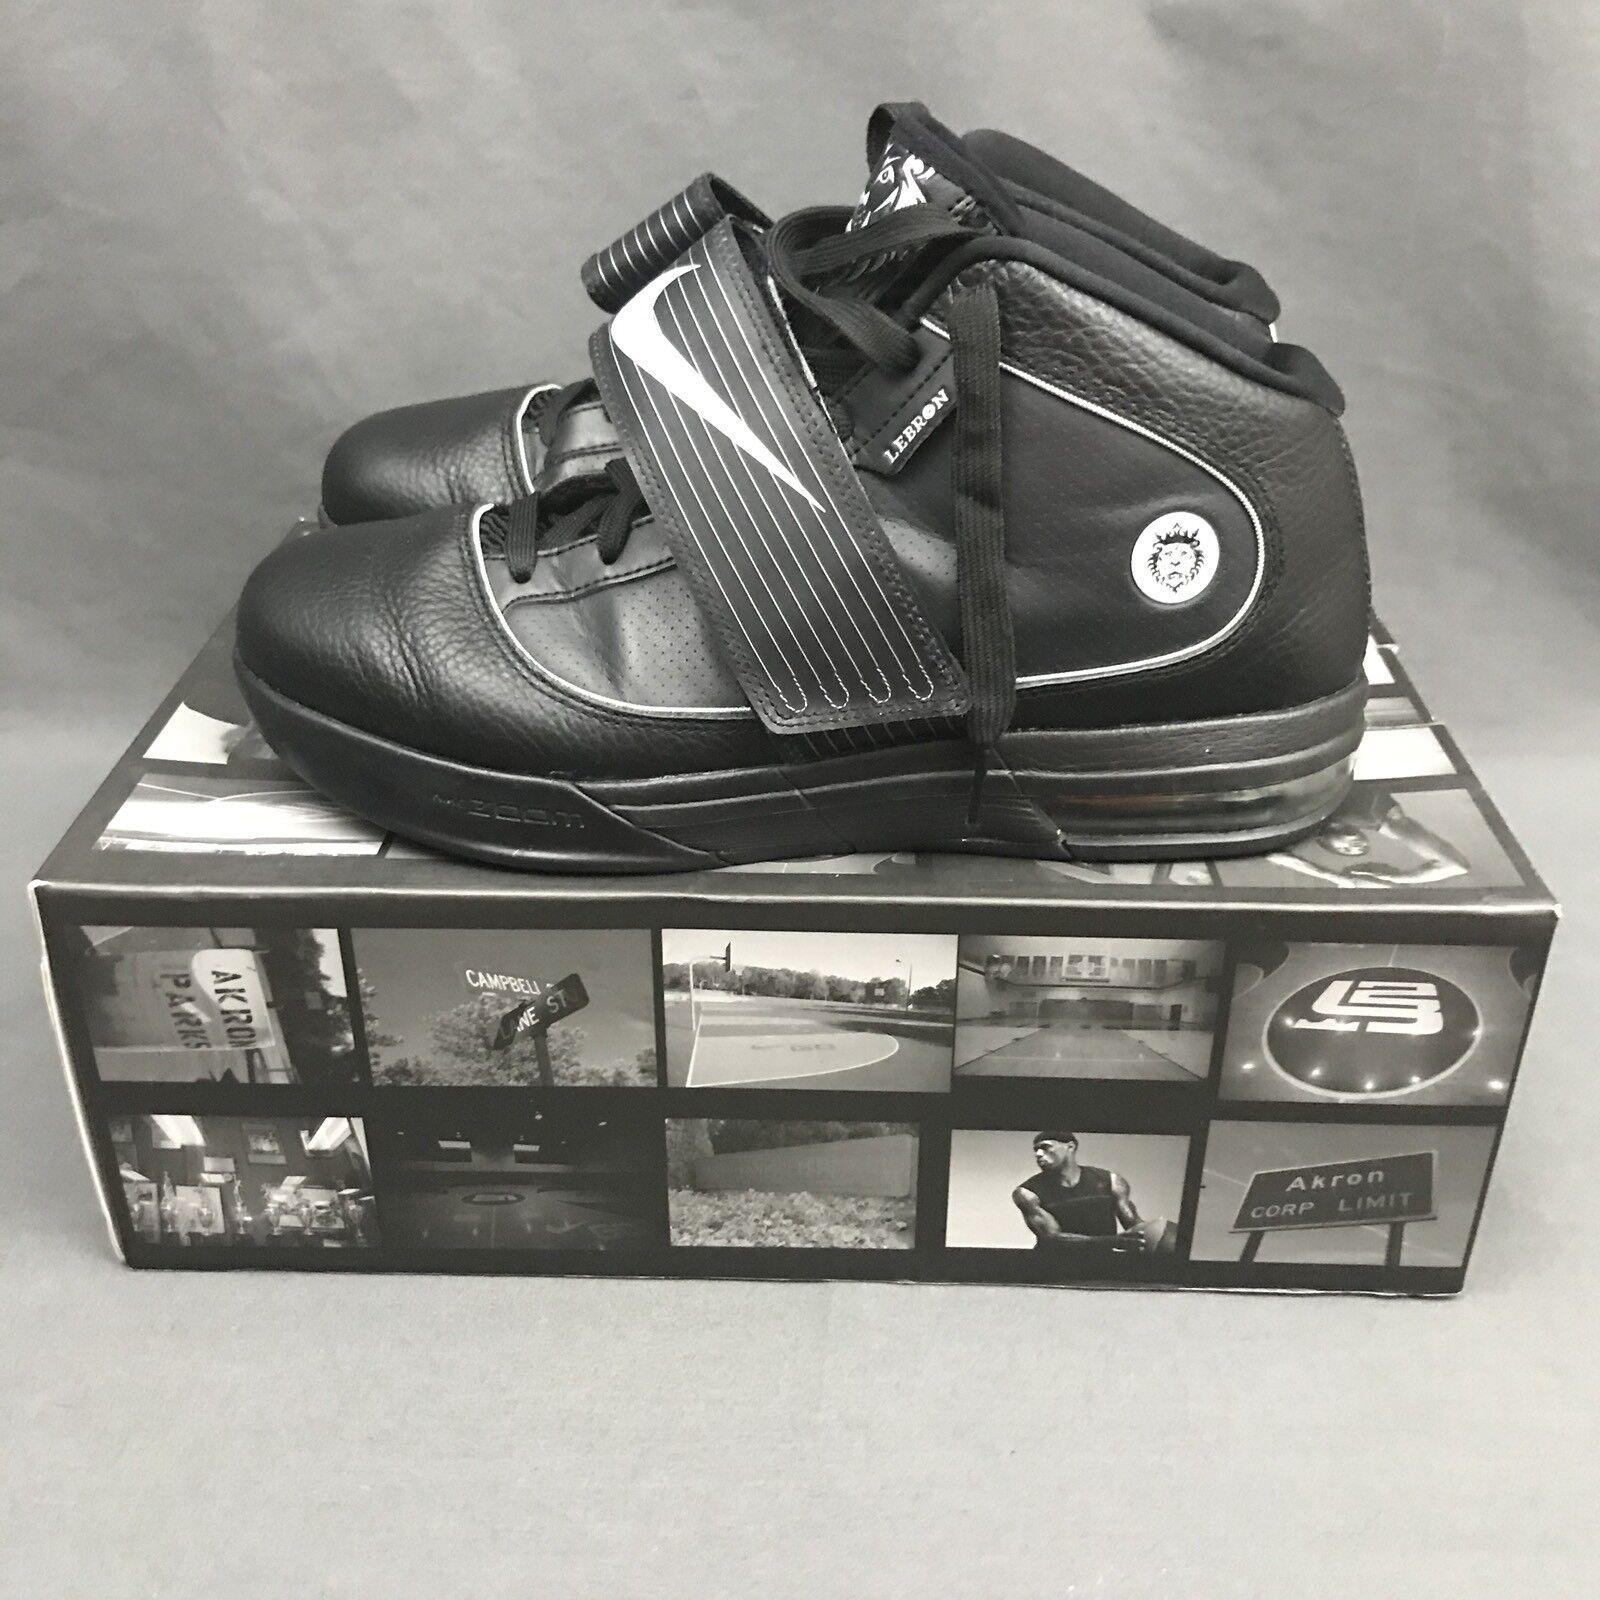 Nike Zoom Soldier IV TB 2010 Black Sneakers 407630 001 Size 10 w/ Original Box